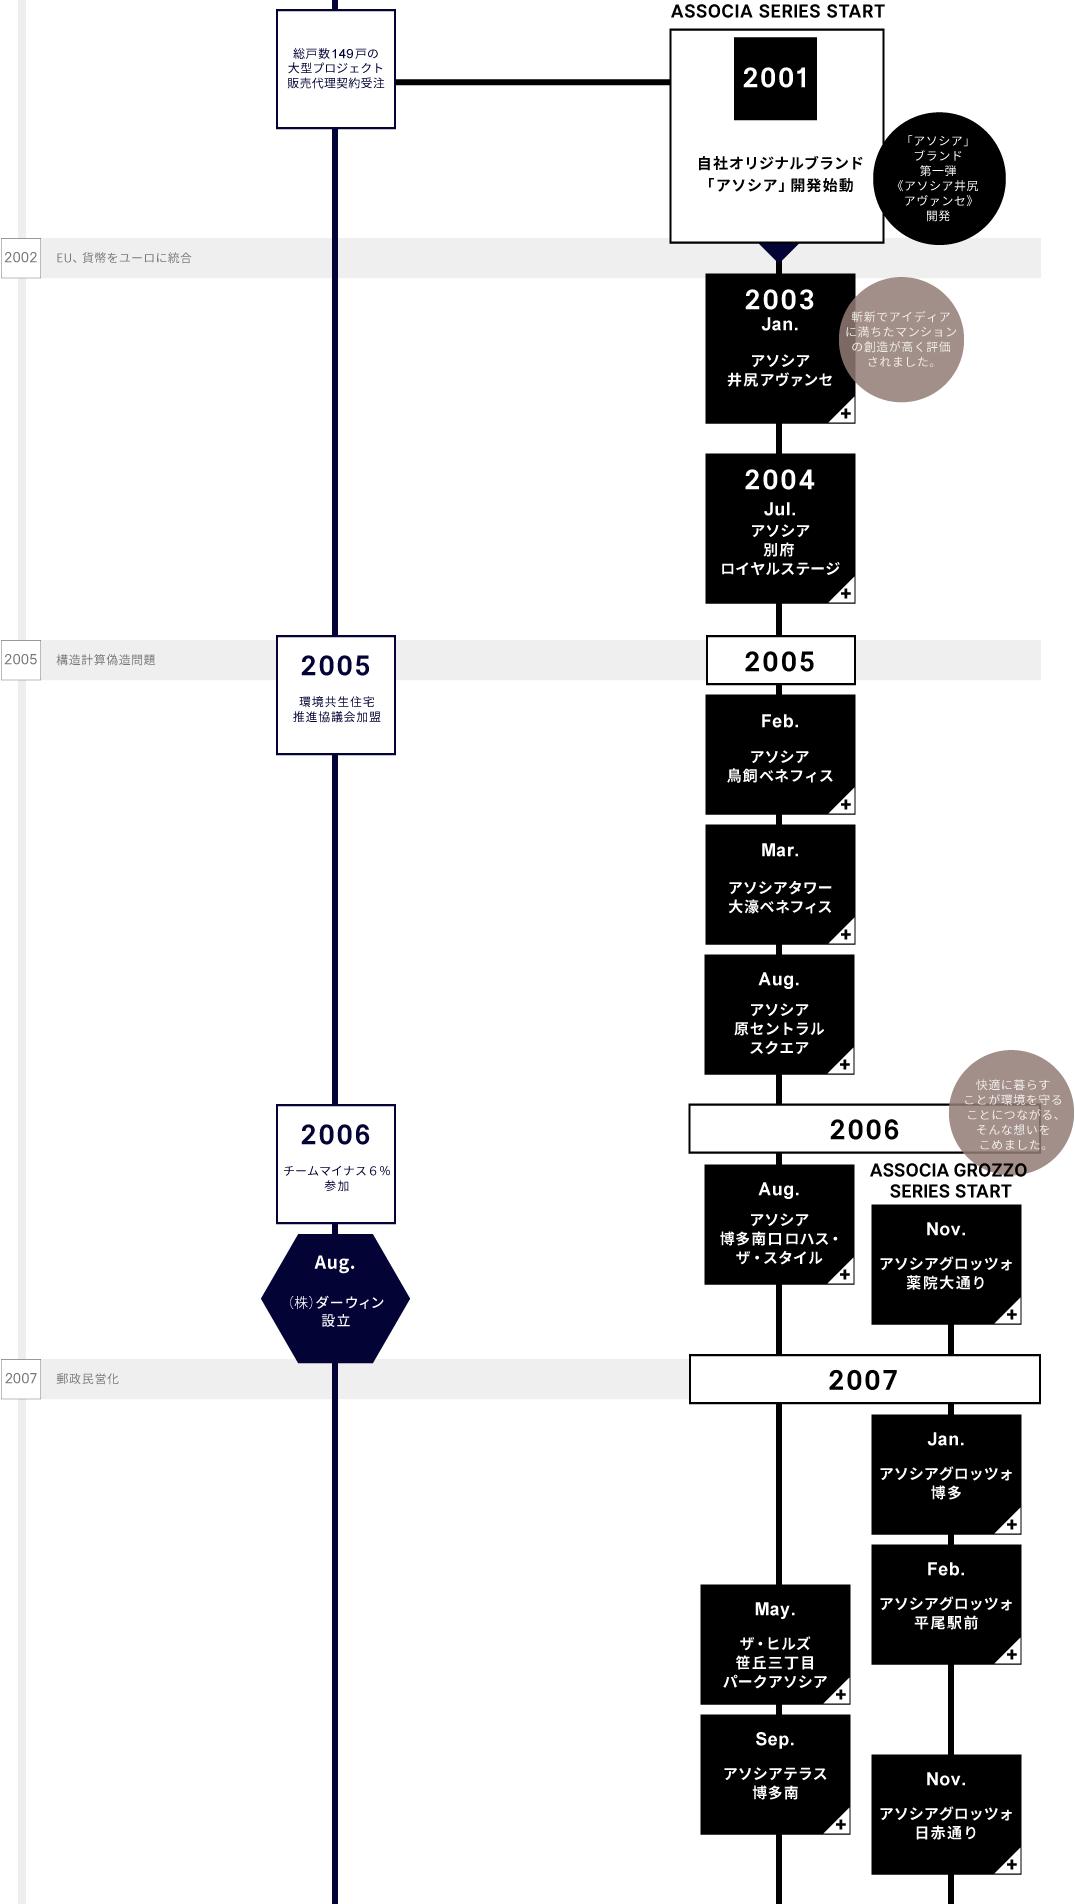 LANDICの歴史2001-2007